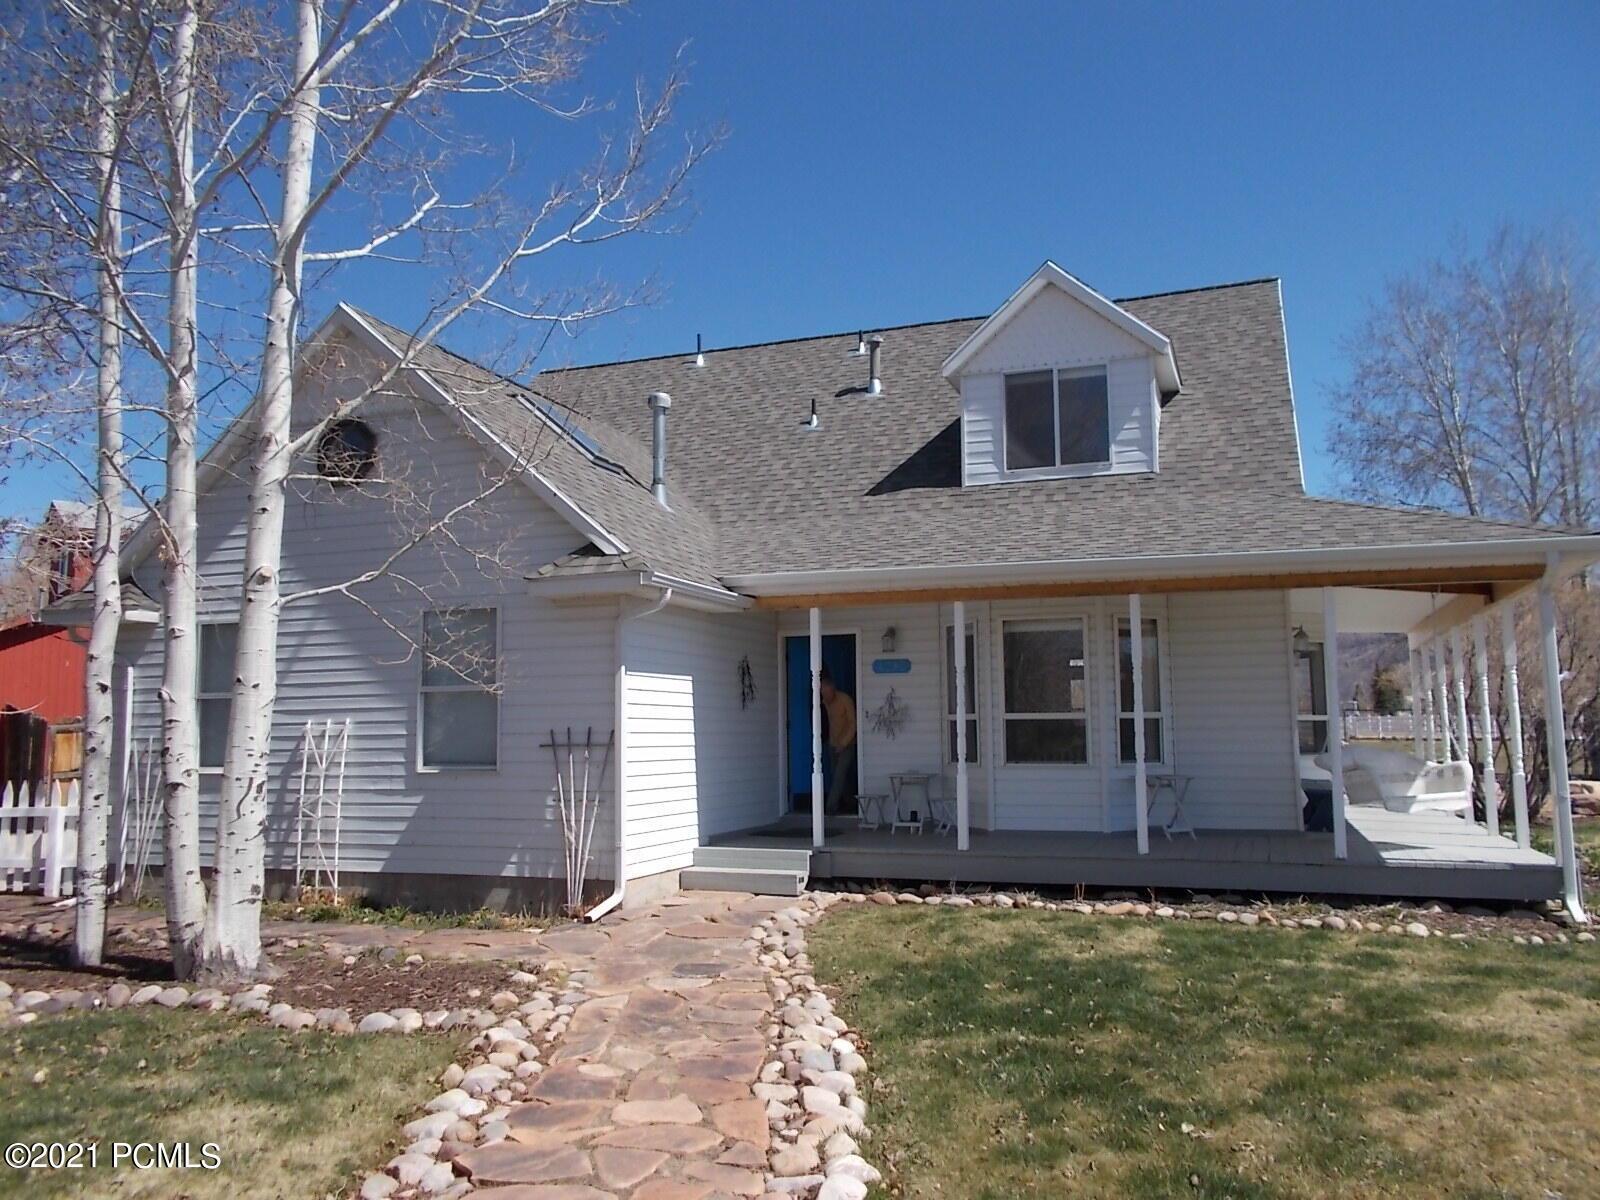 4390 Meadow Lane, Oakley, Utah 84055, 4 Bedrooms Bedrooms, ,4 BathroomsBathrooms,Single Family,For Sale,Meadow,12101399